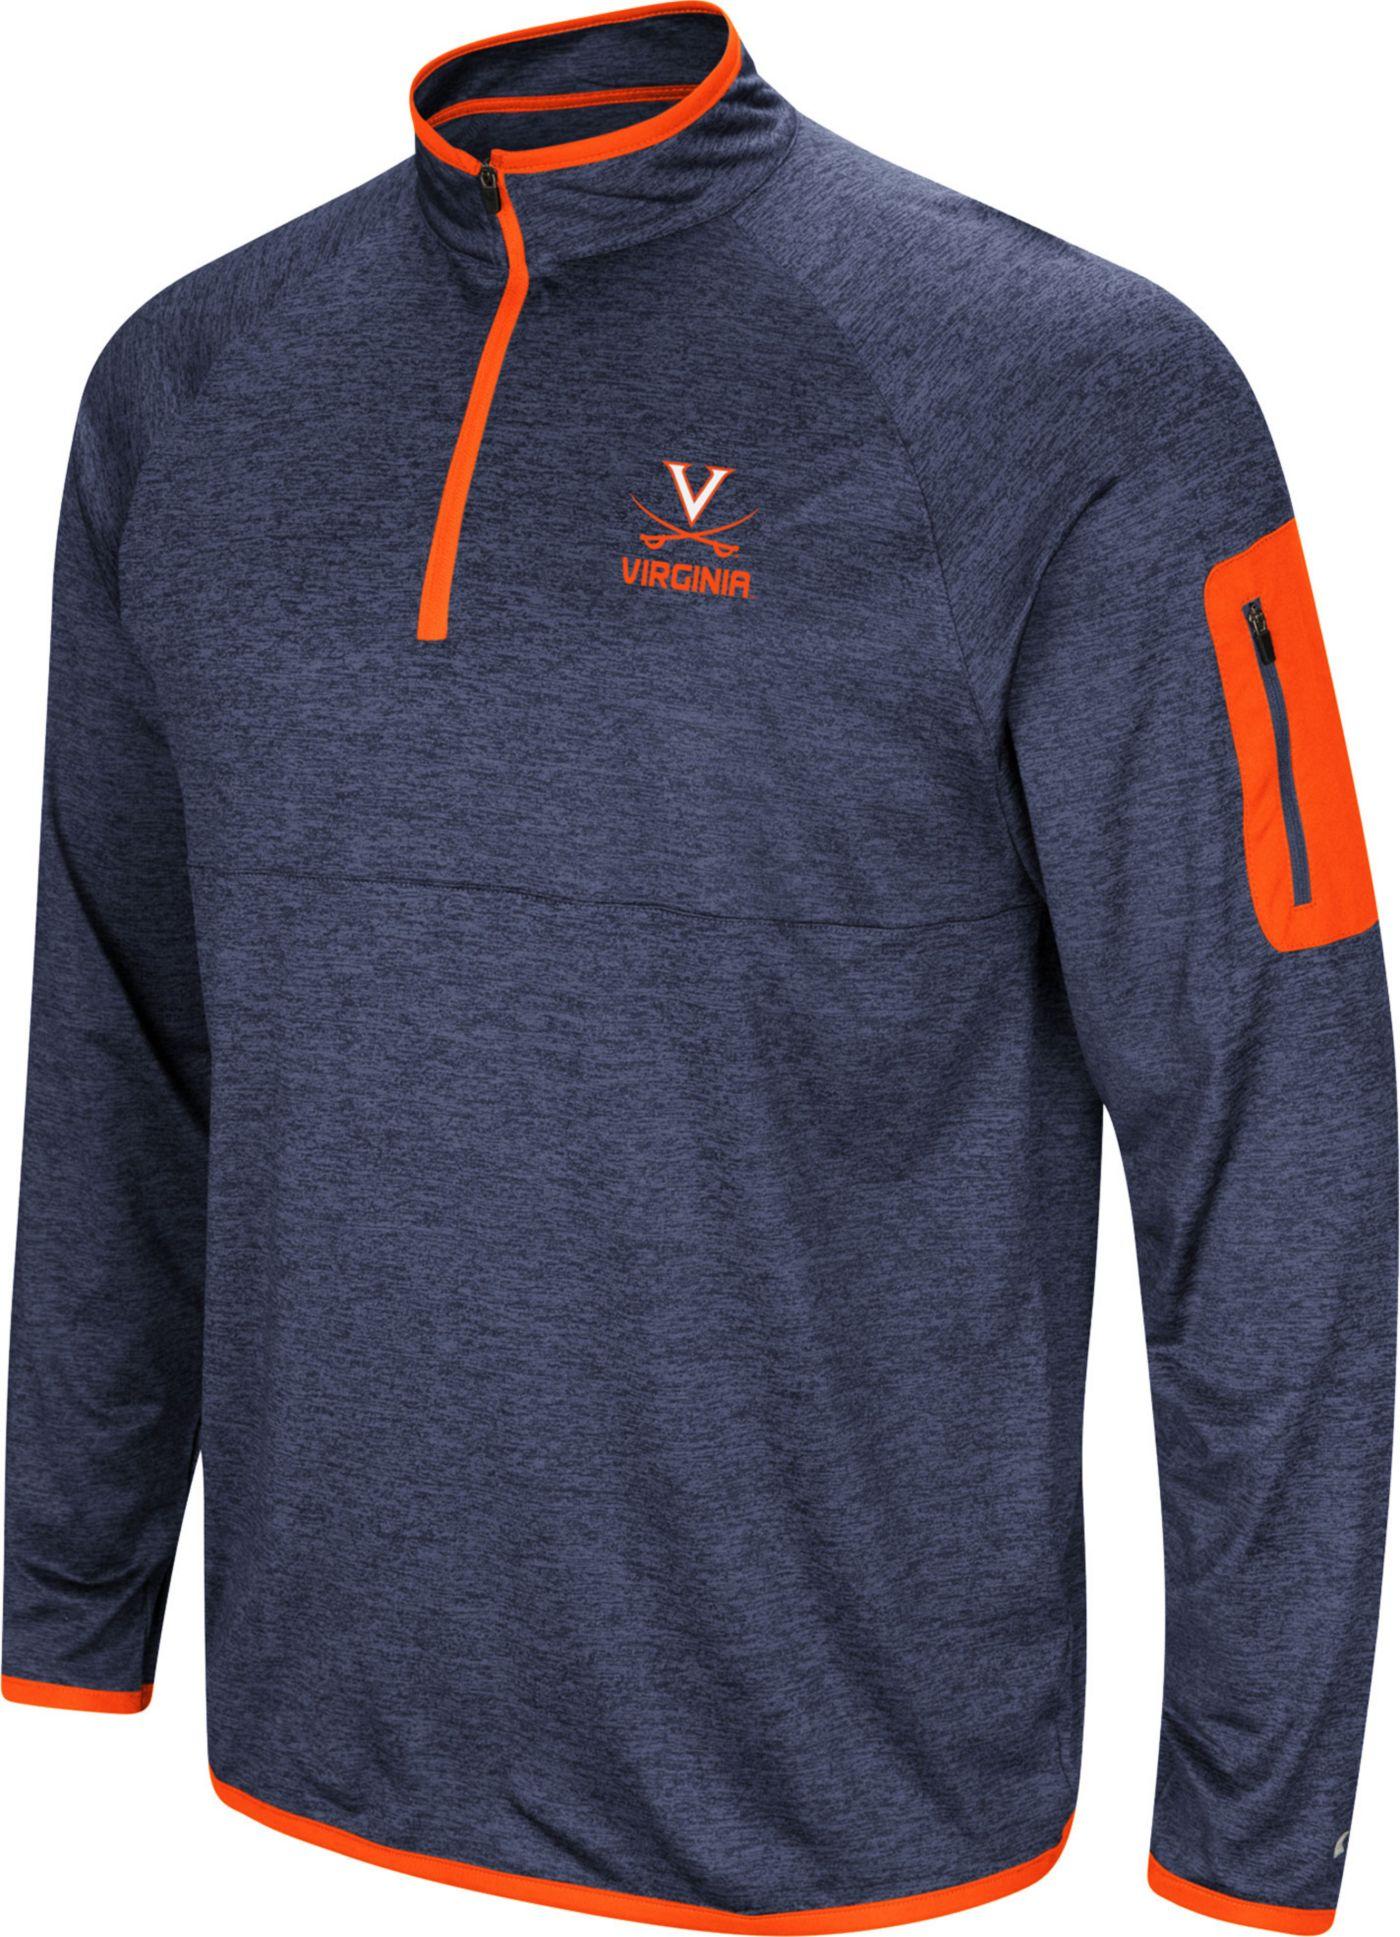 Colosseum Men's Virginia Cavaliers Blue Indus River Quarter-Zip Shirt